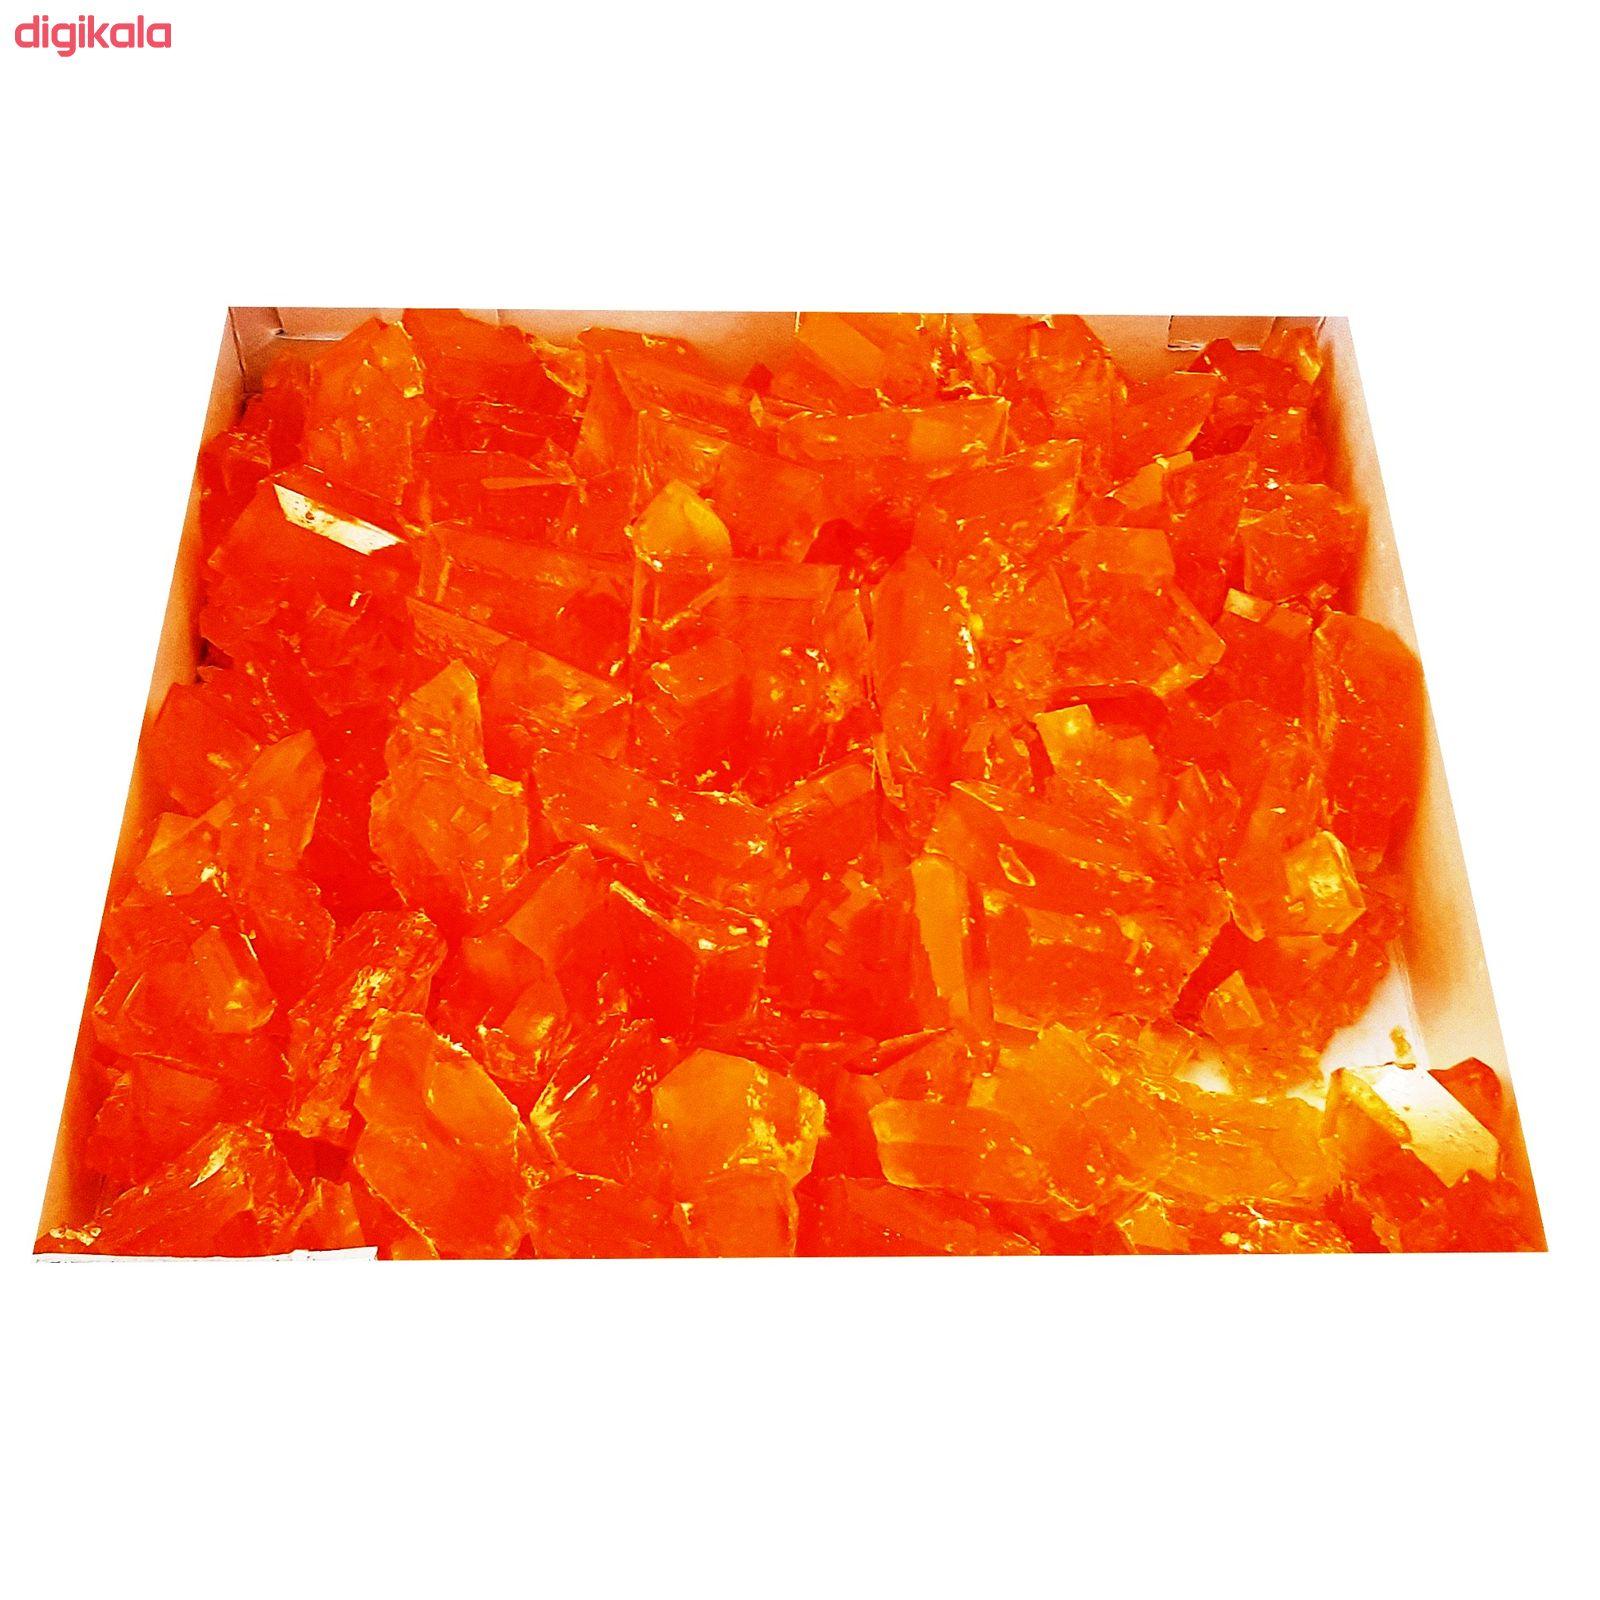 لقمه نبات زعفرانی افضلی - 2 کیلوگرم main 1 2